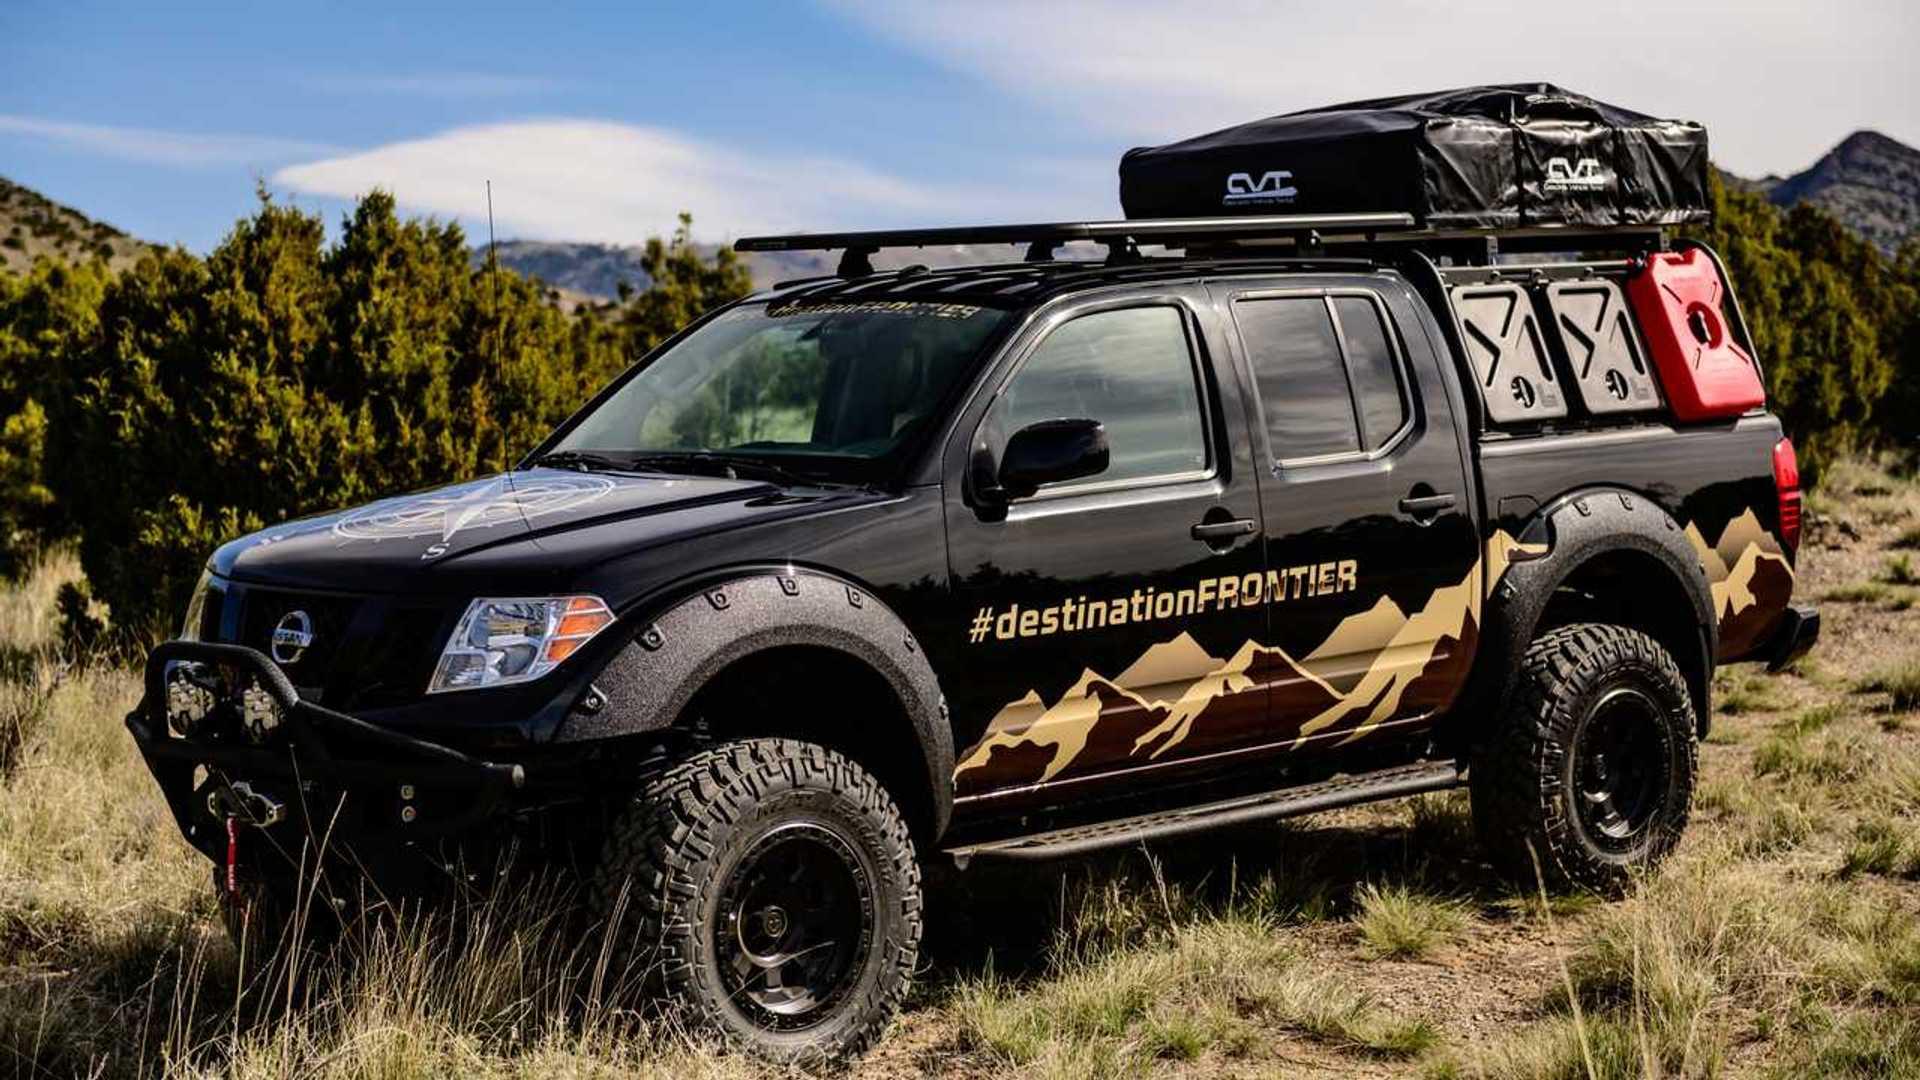 Nissan Destination Frontier Seeks Inexpensive Camping Adventures